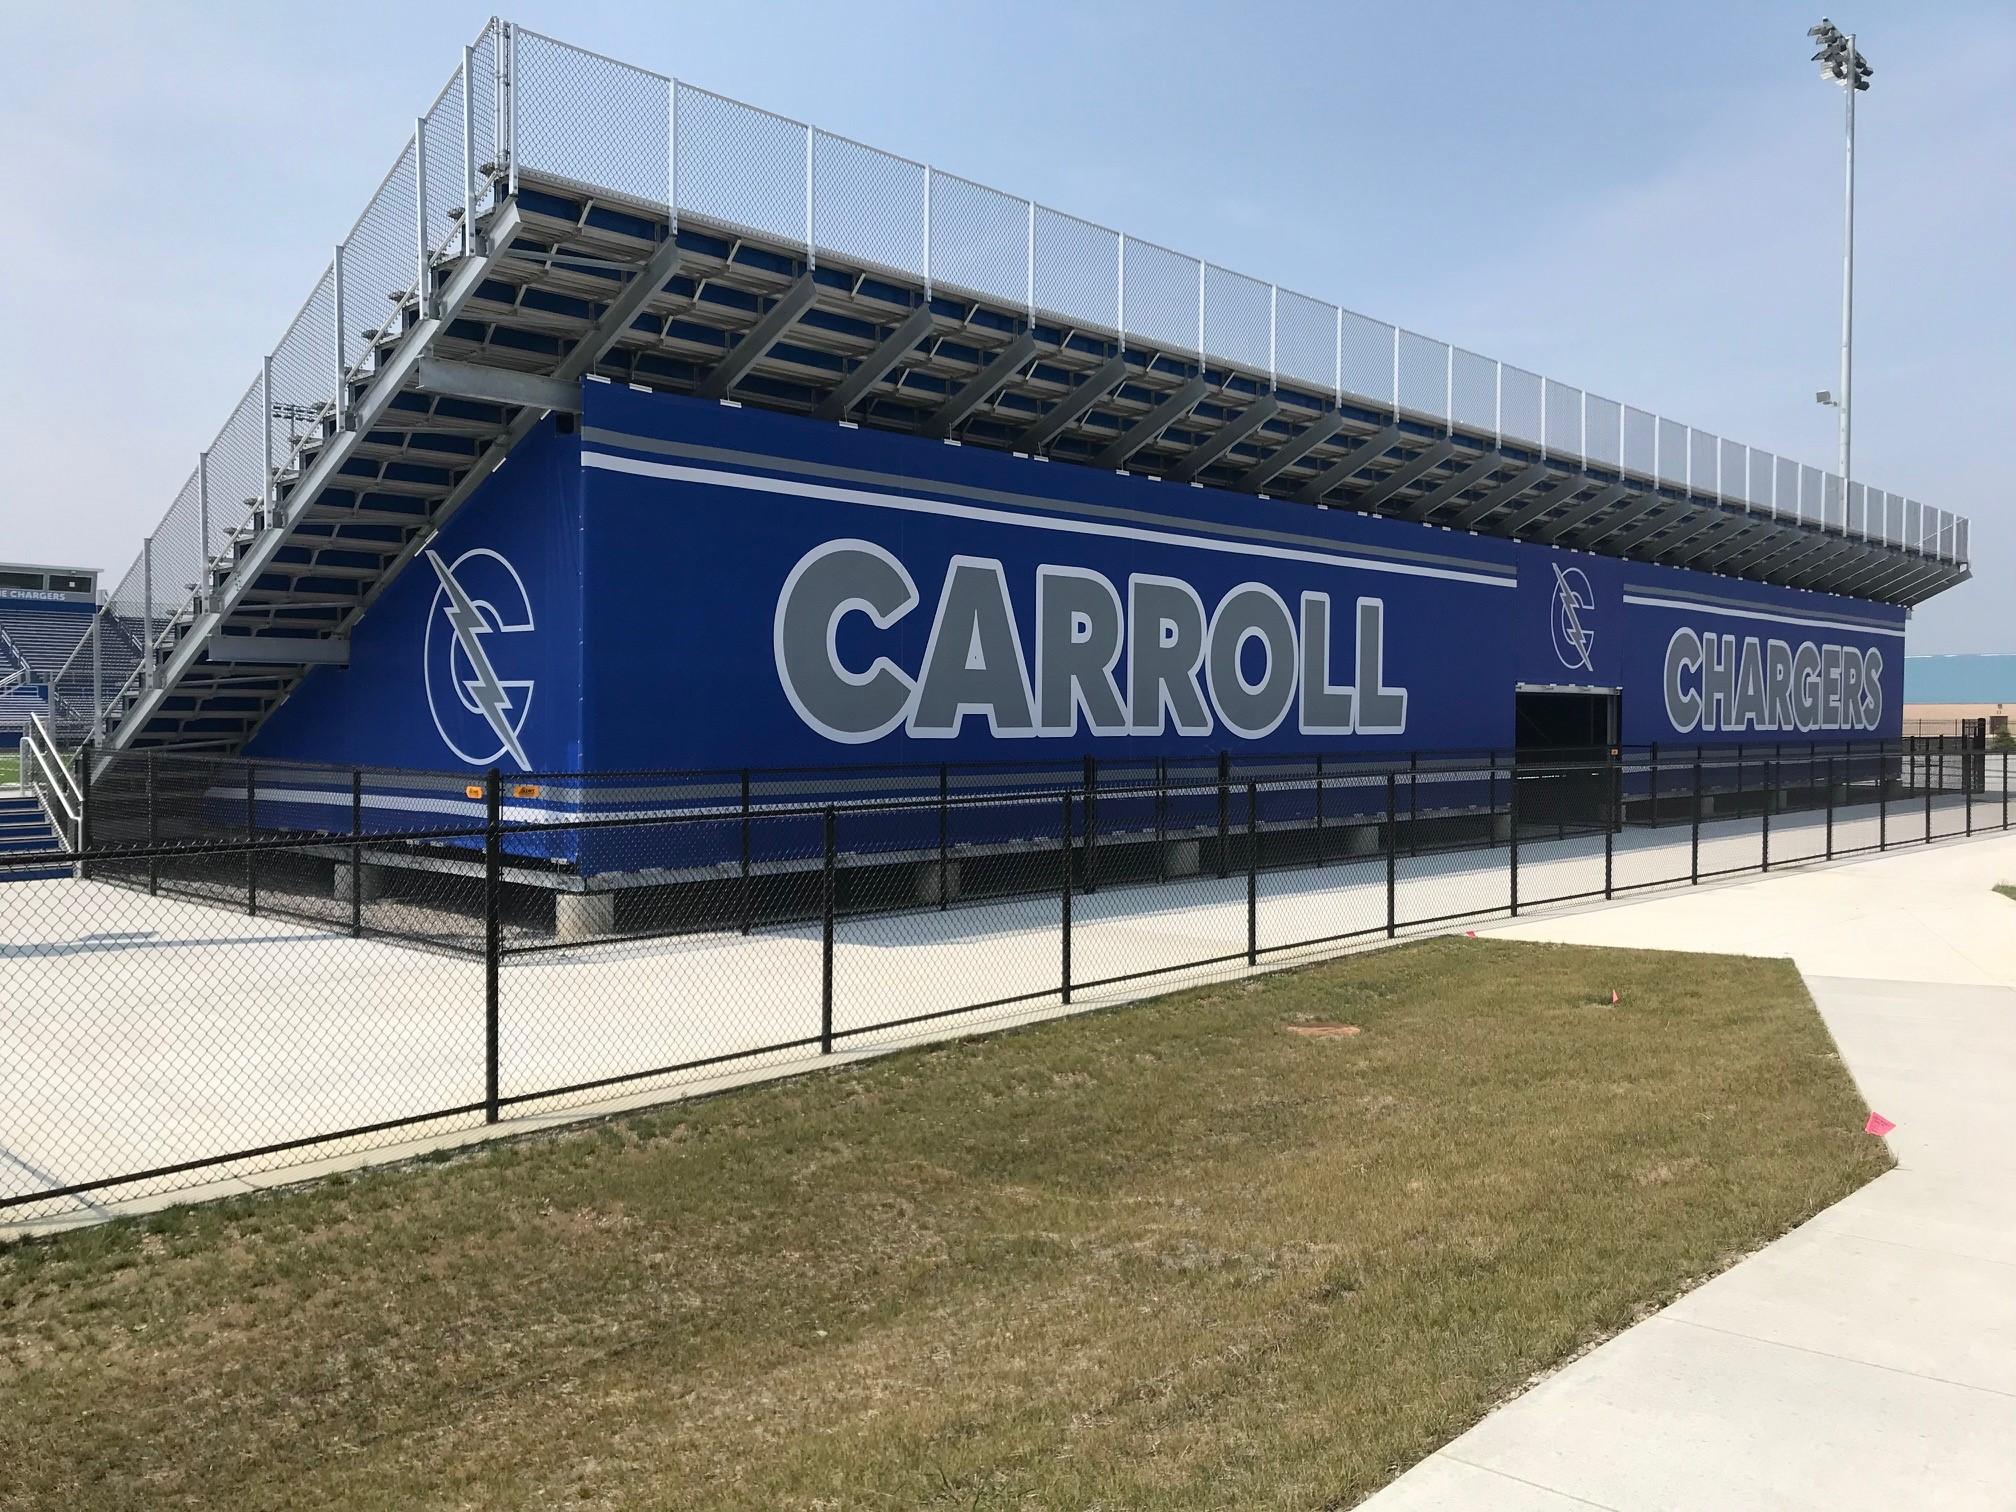 Carroll-football-jersey-wrap2